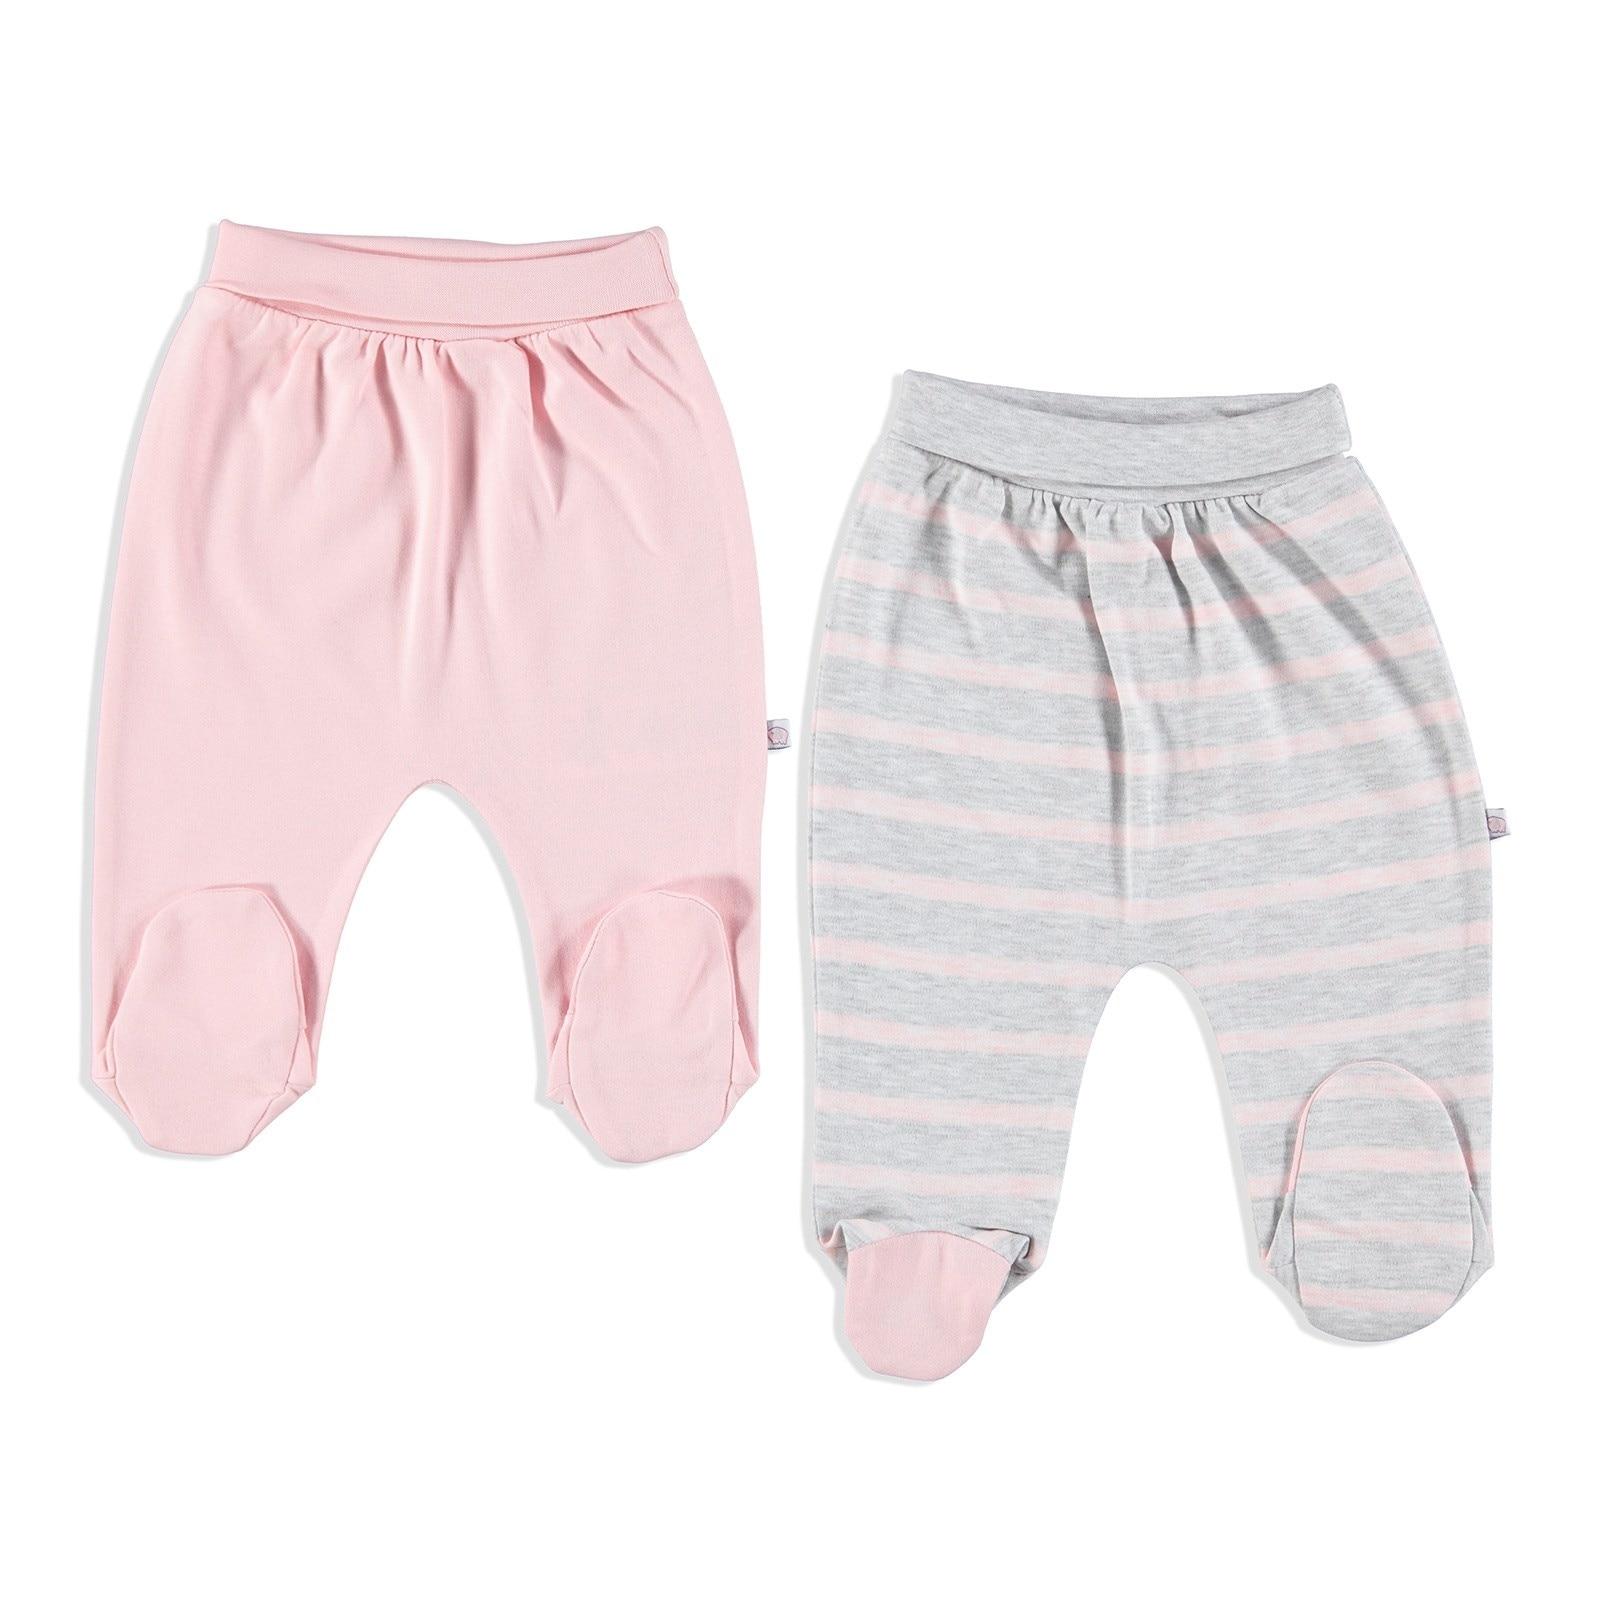 Ebebek Carmin Baby Little Elephant Interlock Footed Pants 2 Pcs